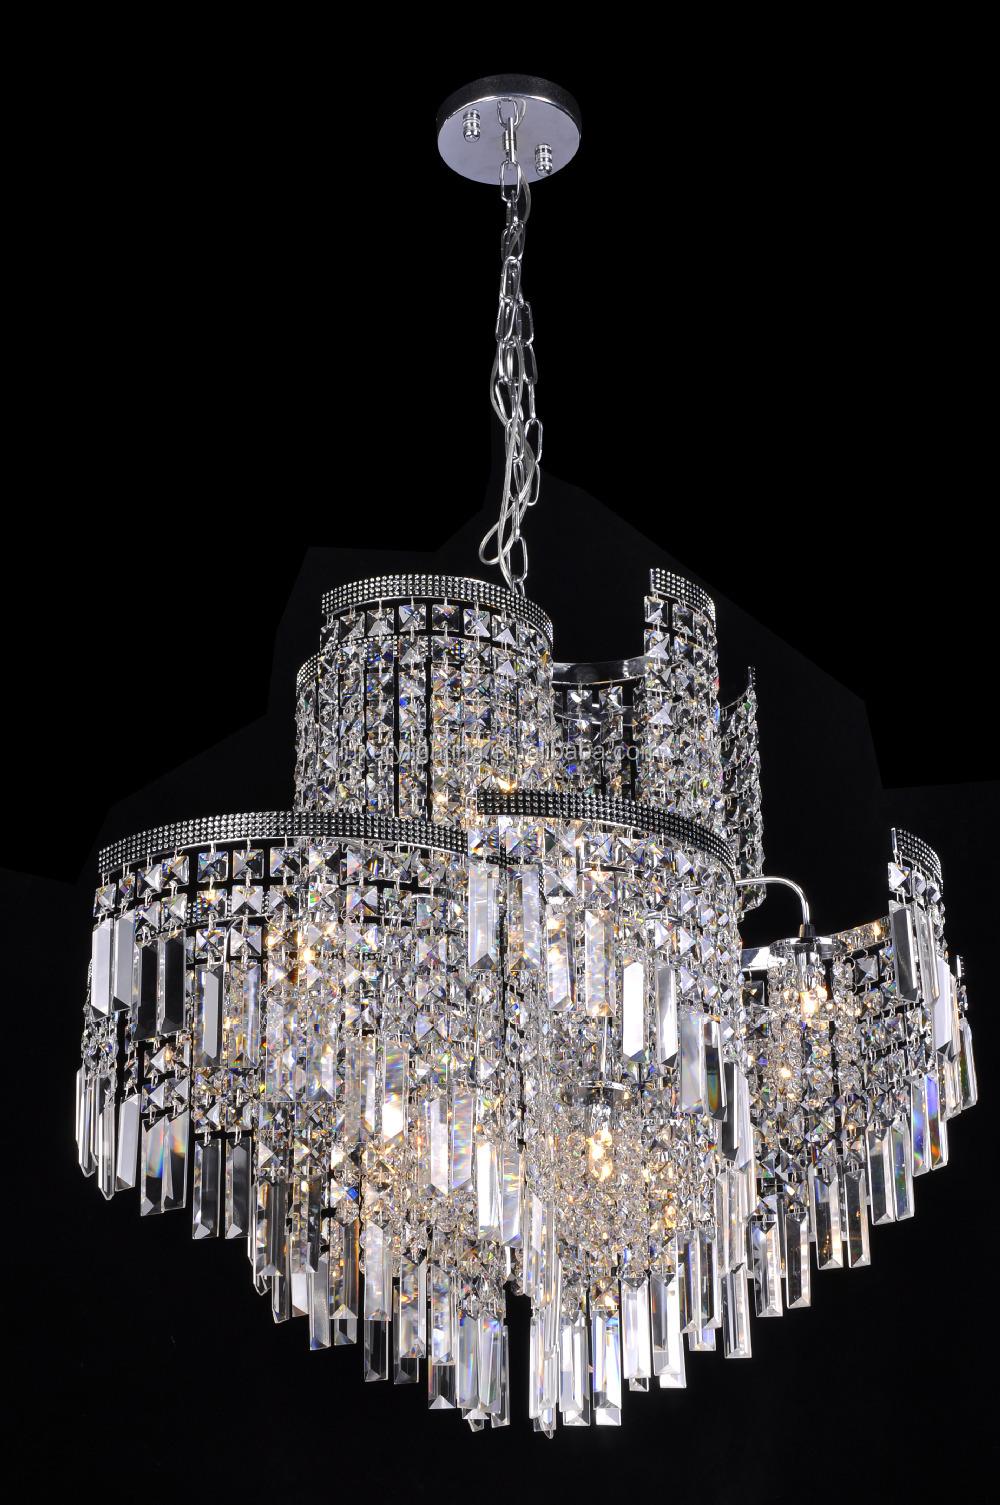 Luxury crystal hanging chandelier / pendant lamps big modern light